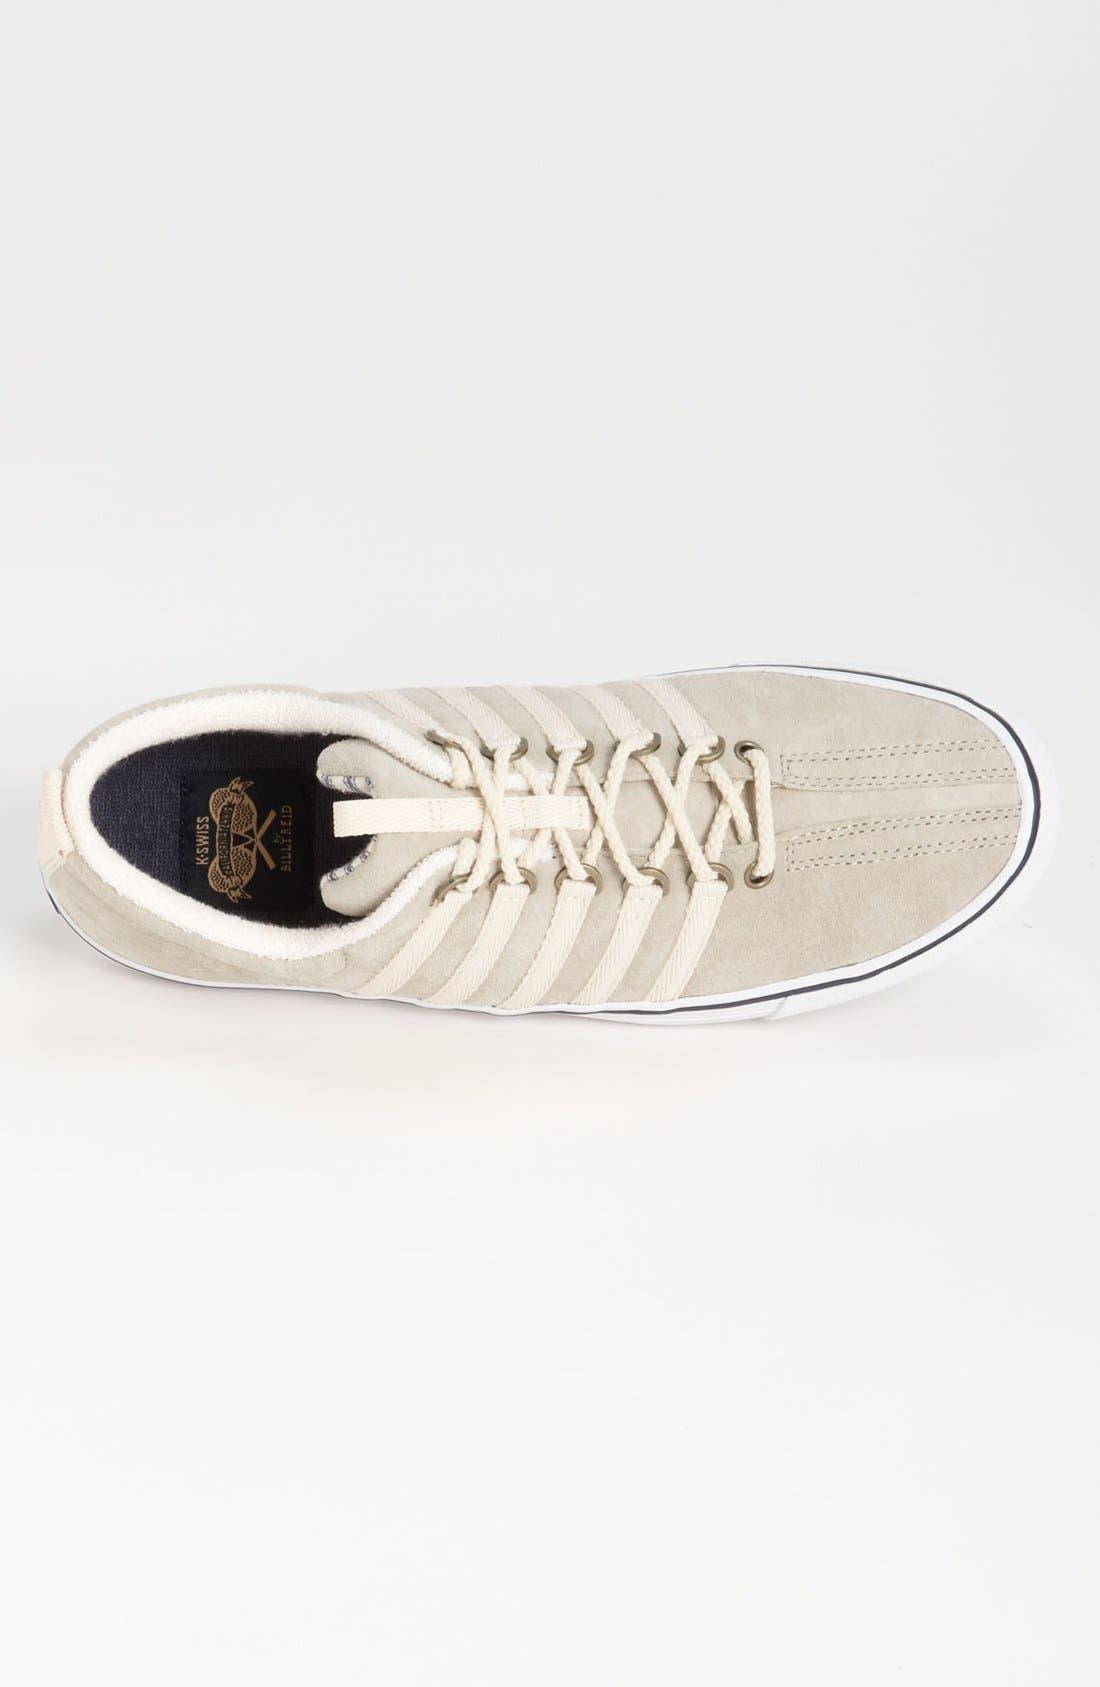 'Billy Reid Venice' Suede Sneaker,                             Alternate thumbnail 2, color,                             052